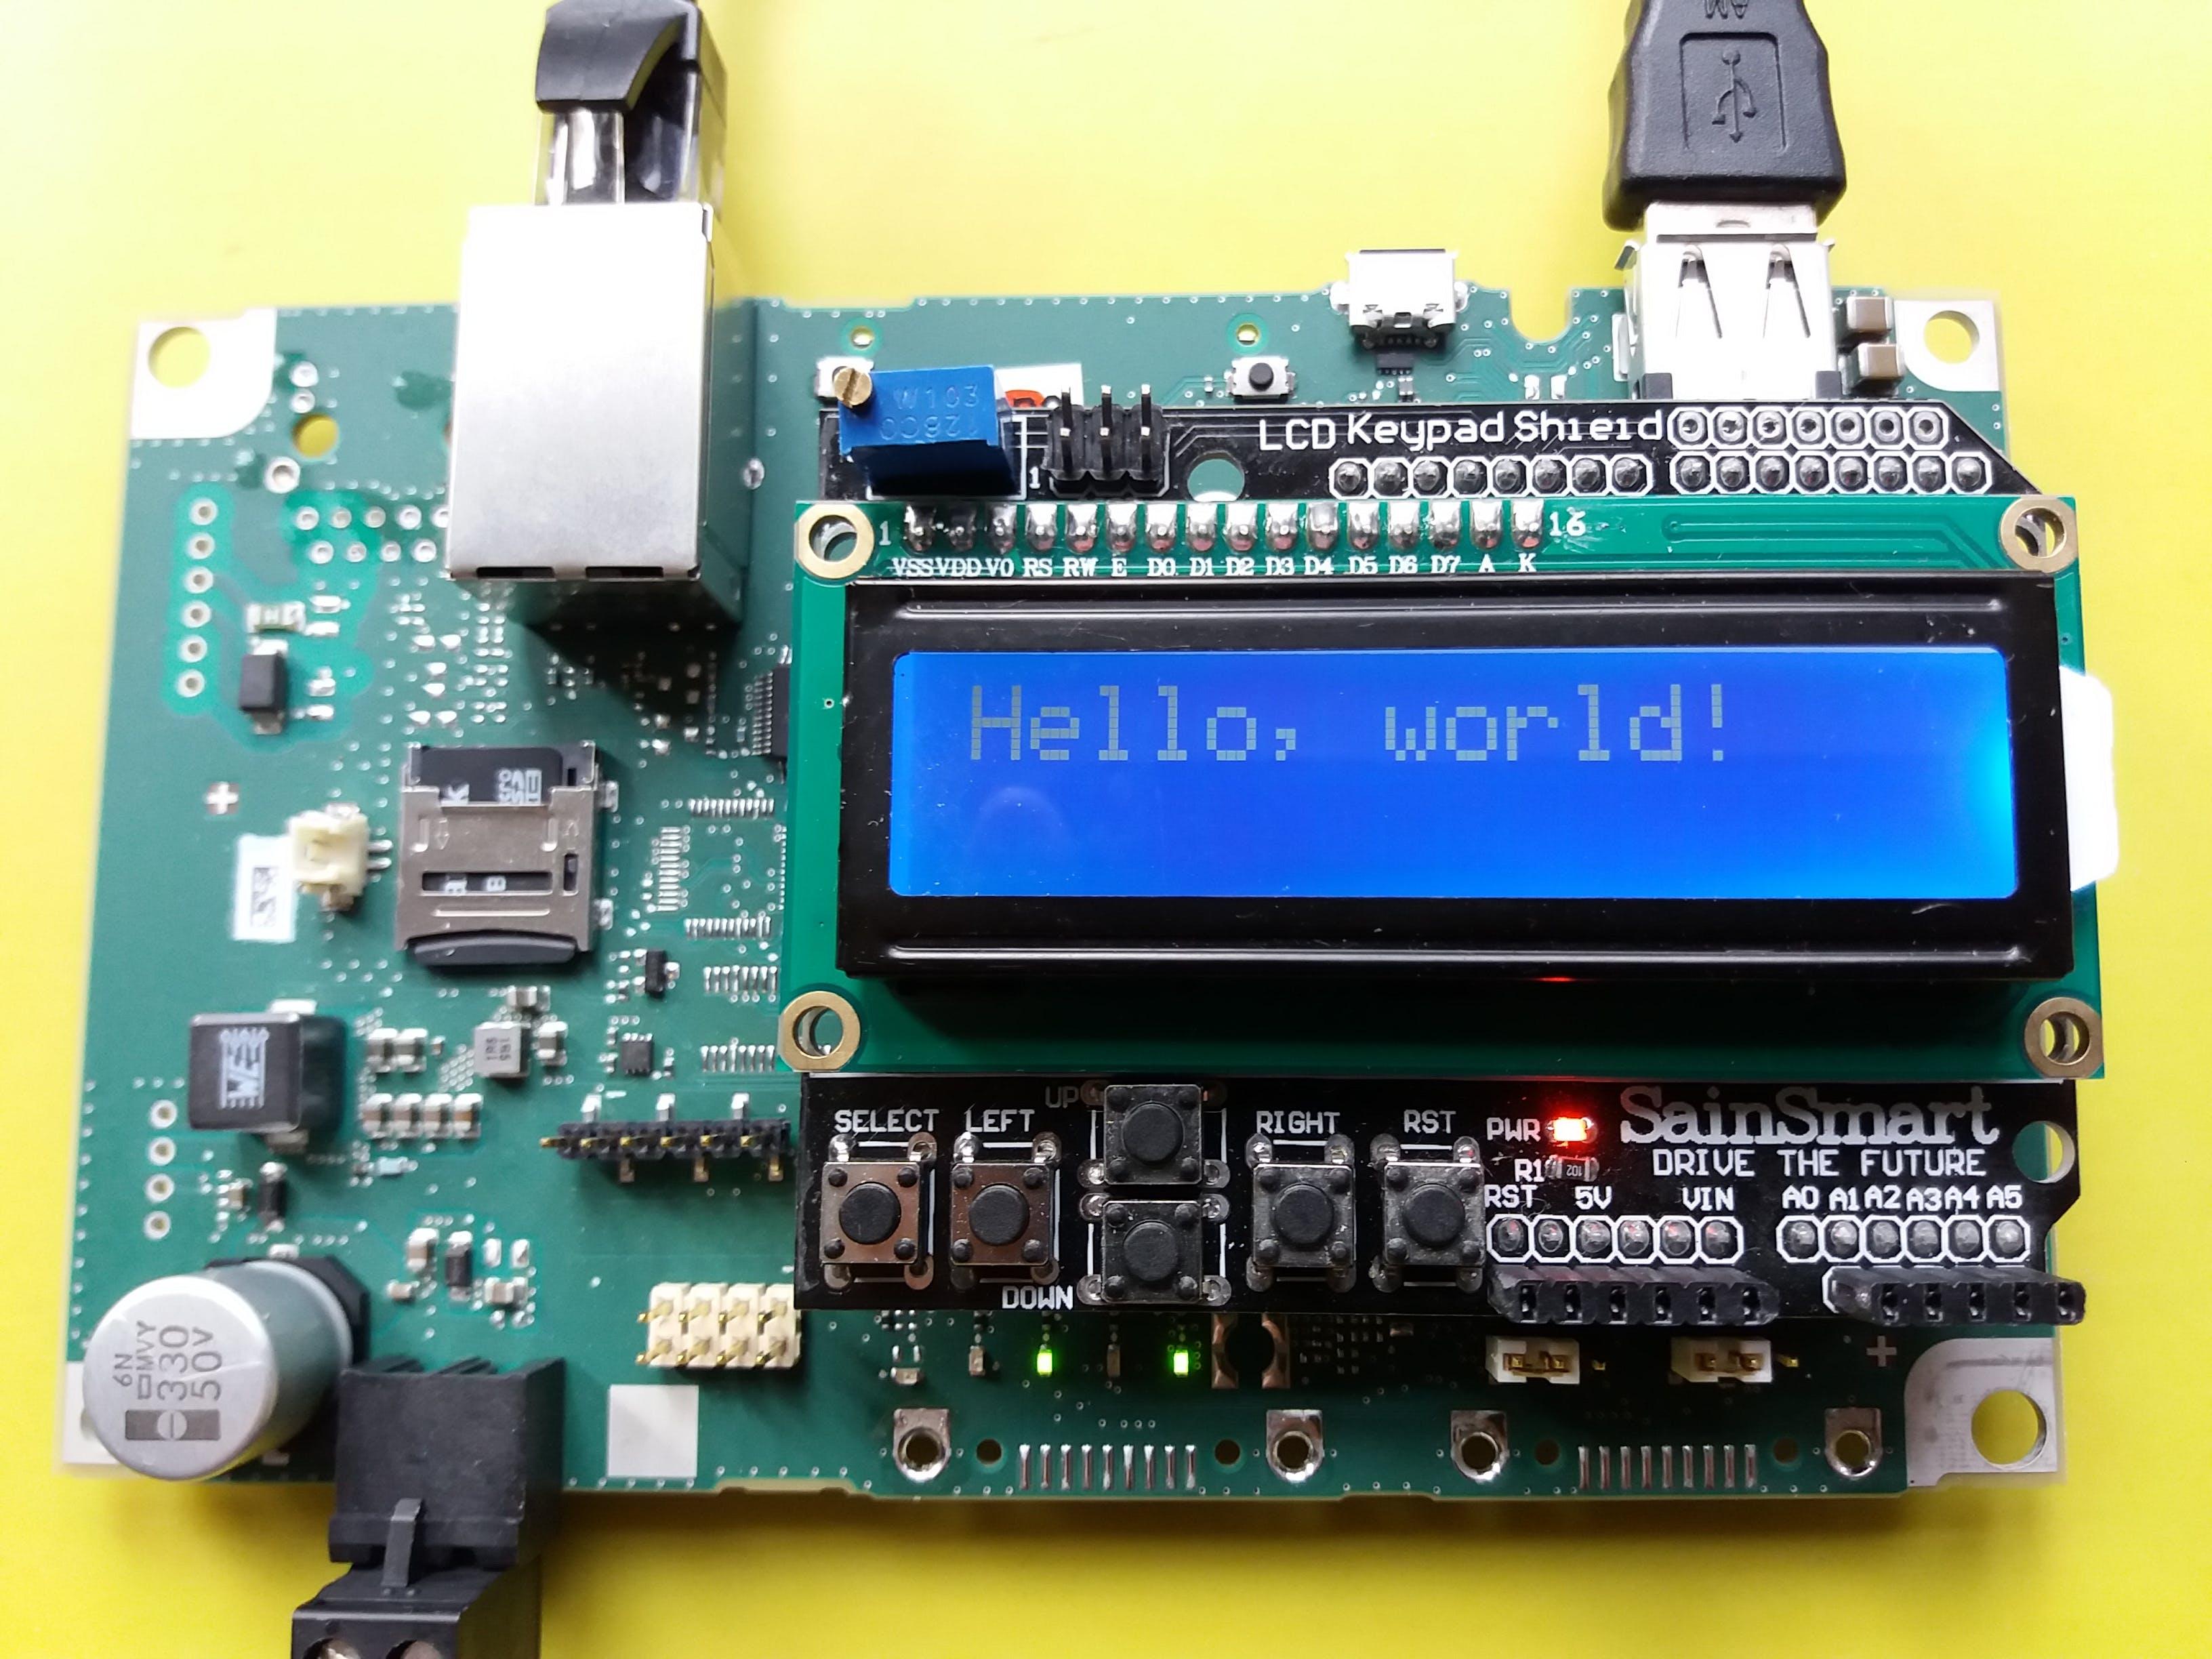 A Sainsmart LCD Keypad shield runs the library